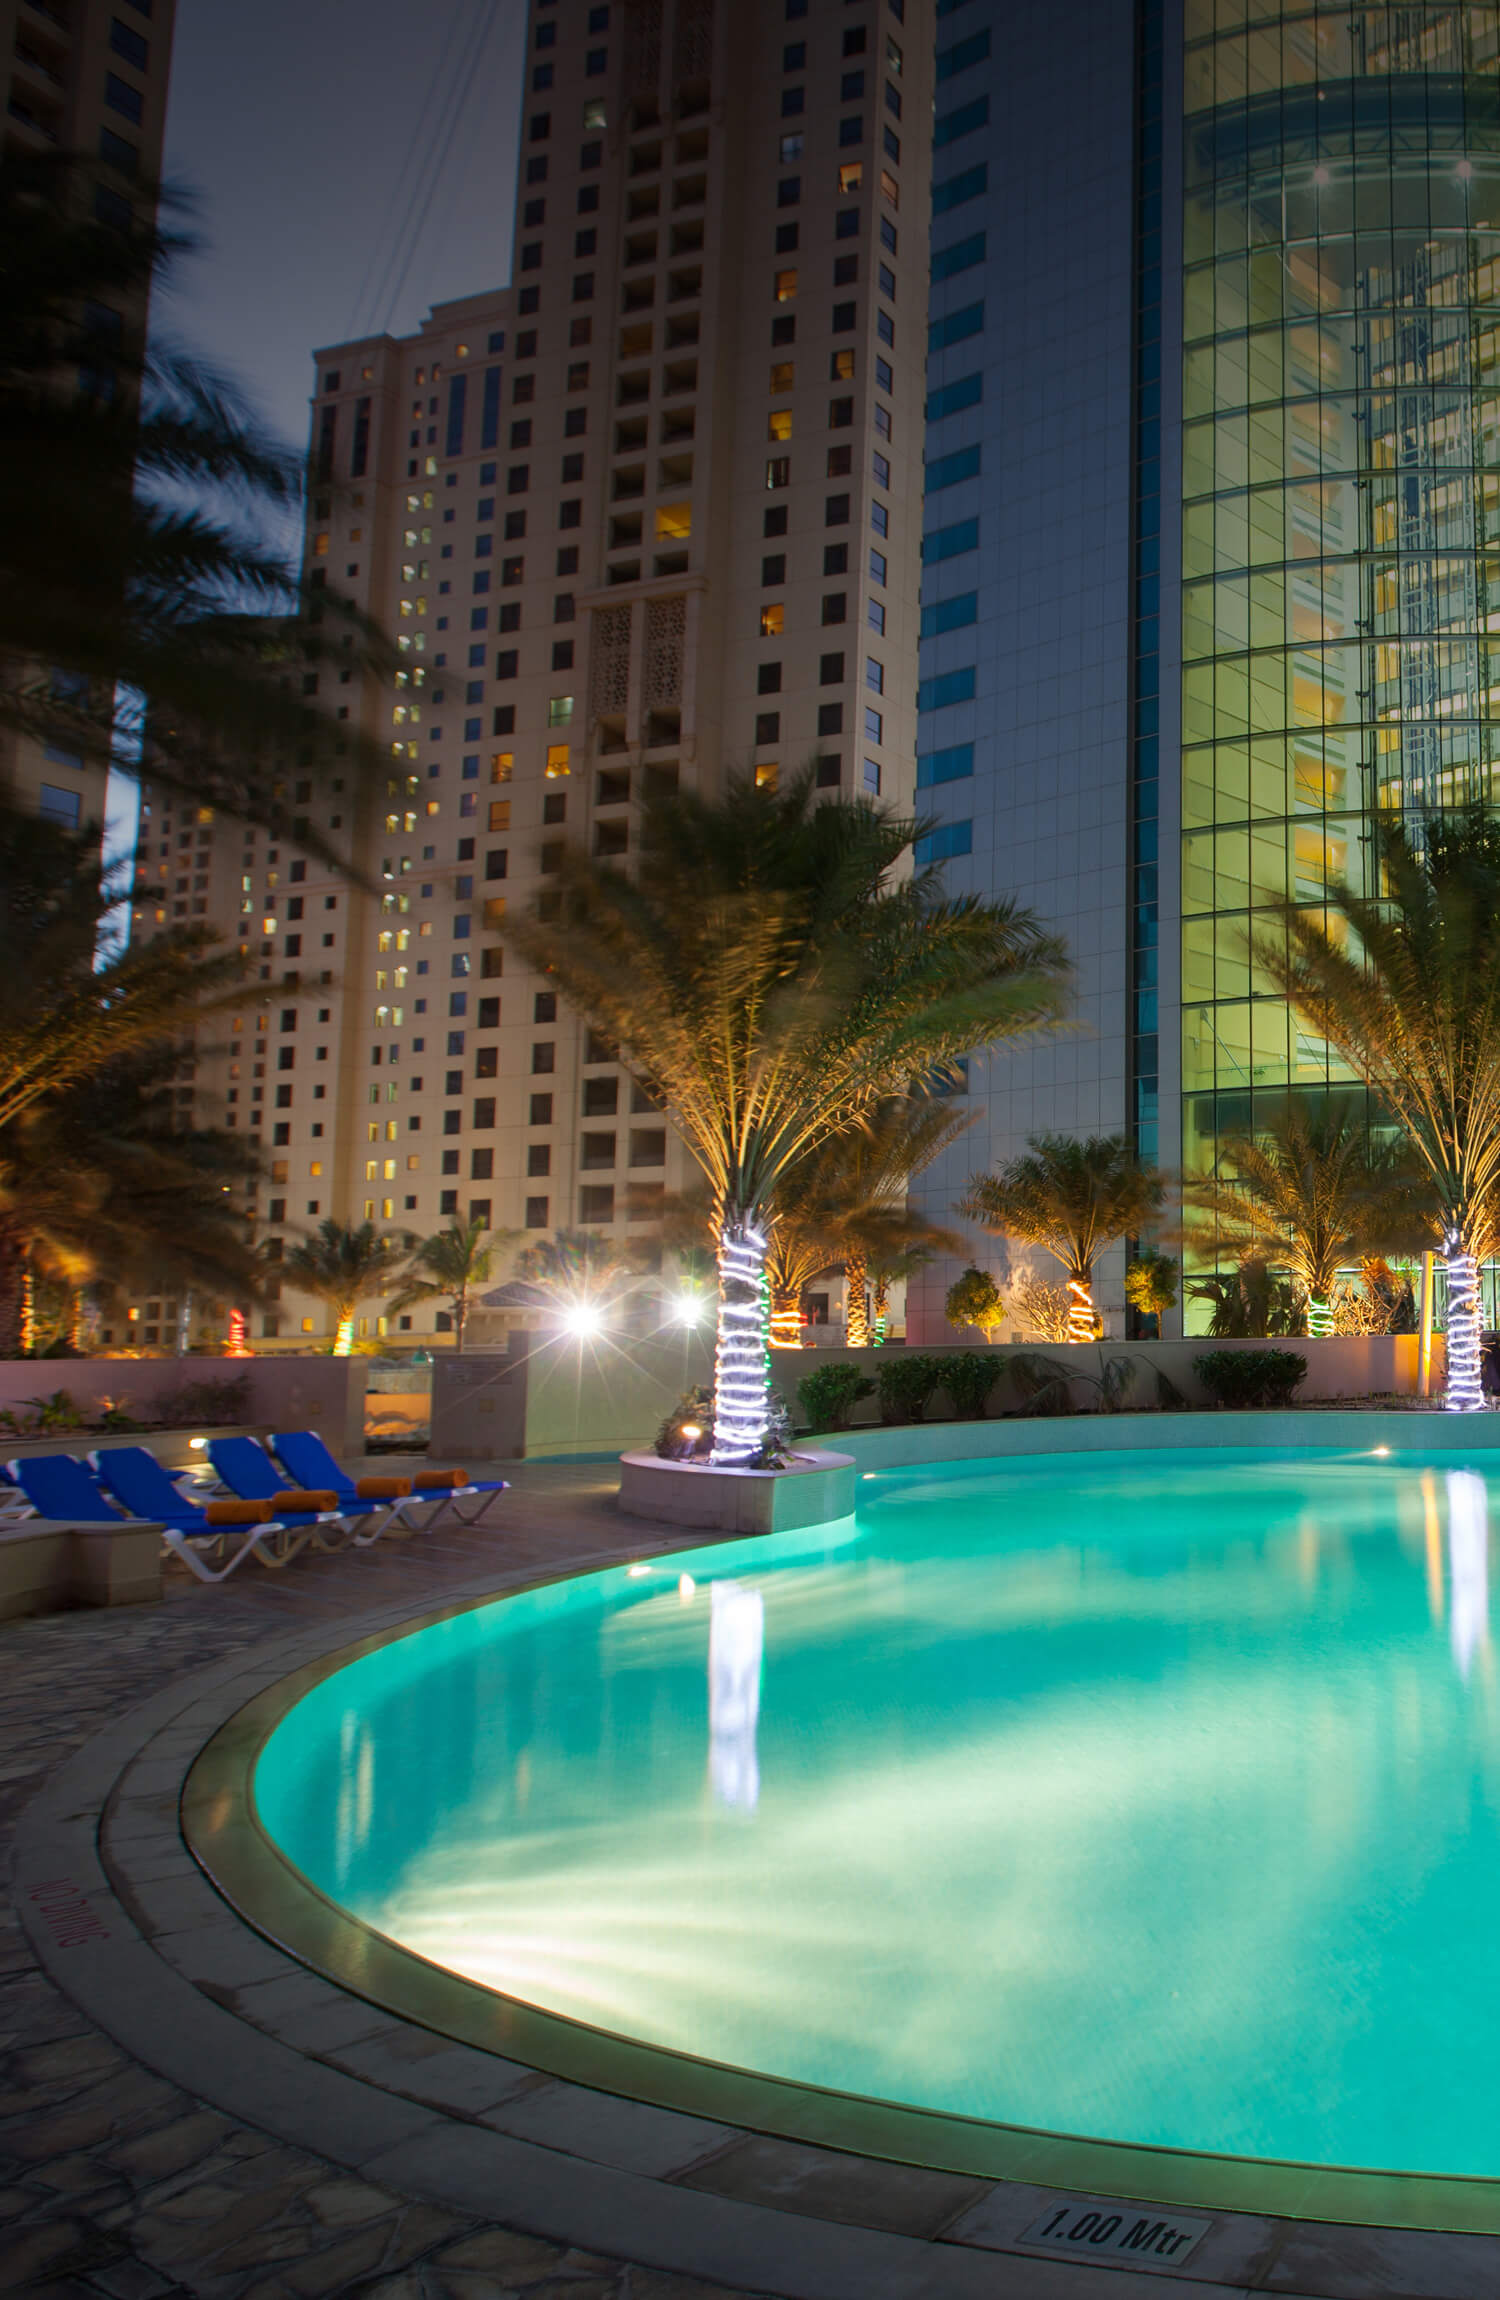 Dubai Oasis Beach Tower Hotel